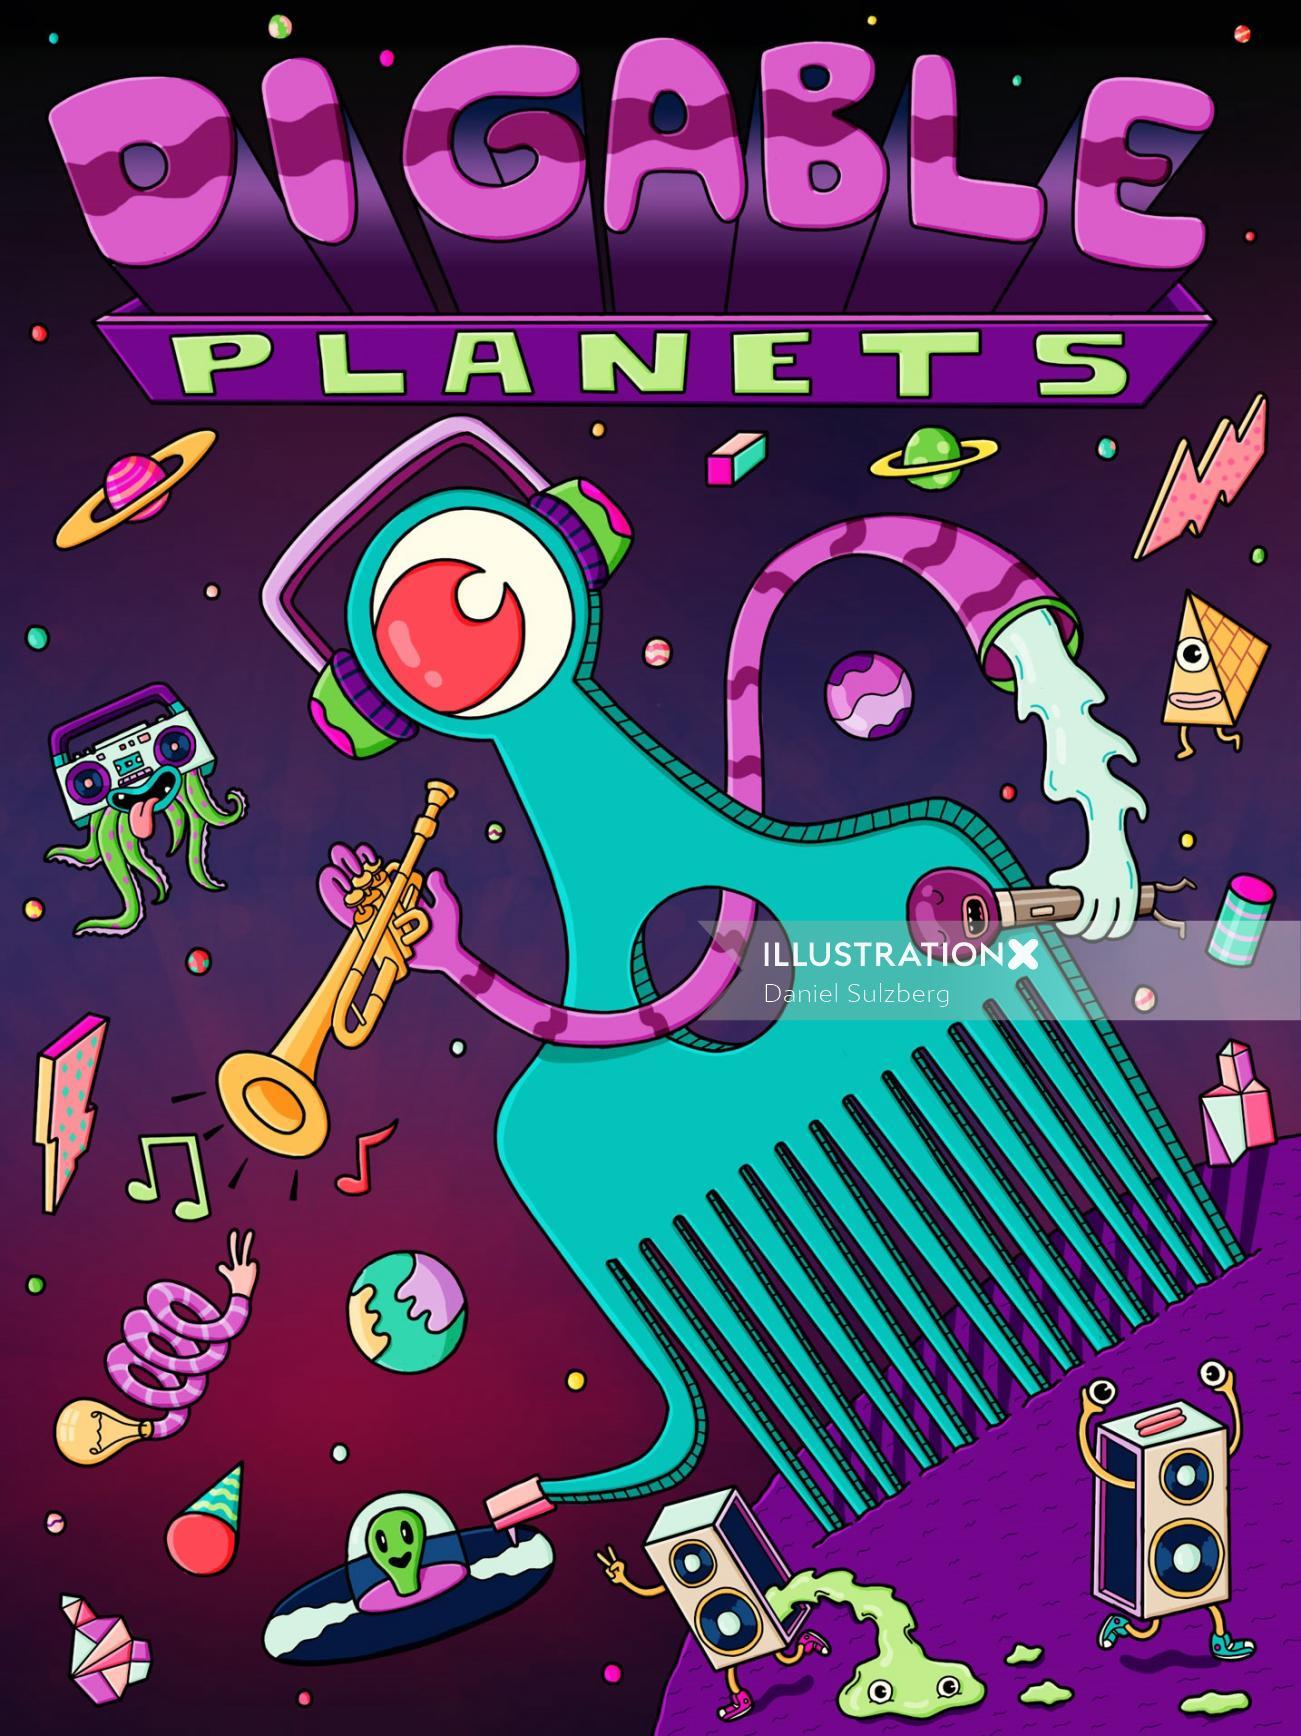 Digable Planets Poster By Daniel Sulzberg Illustrator